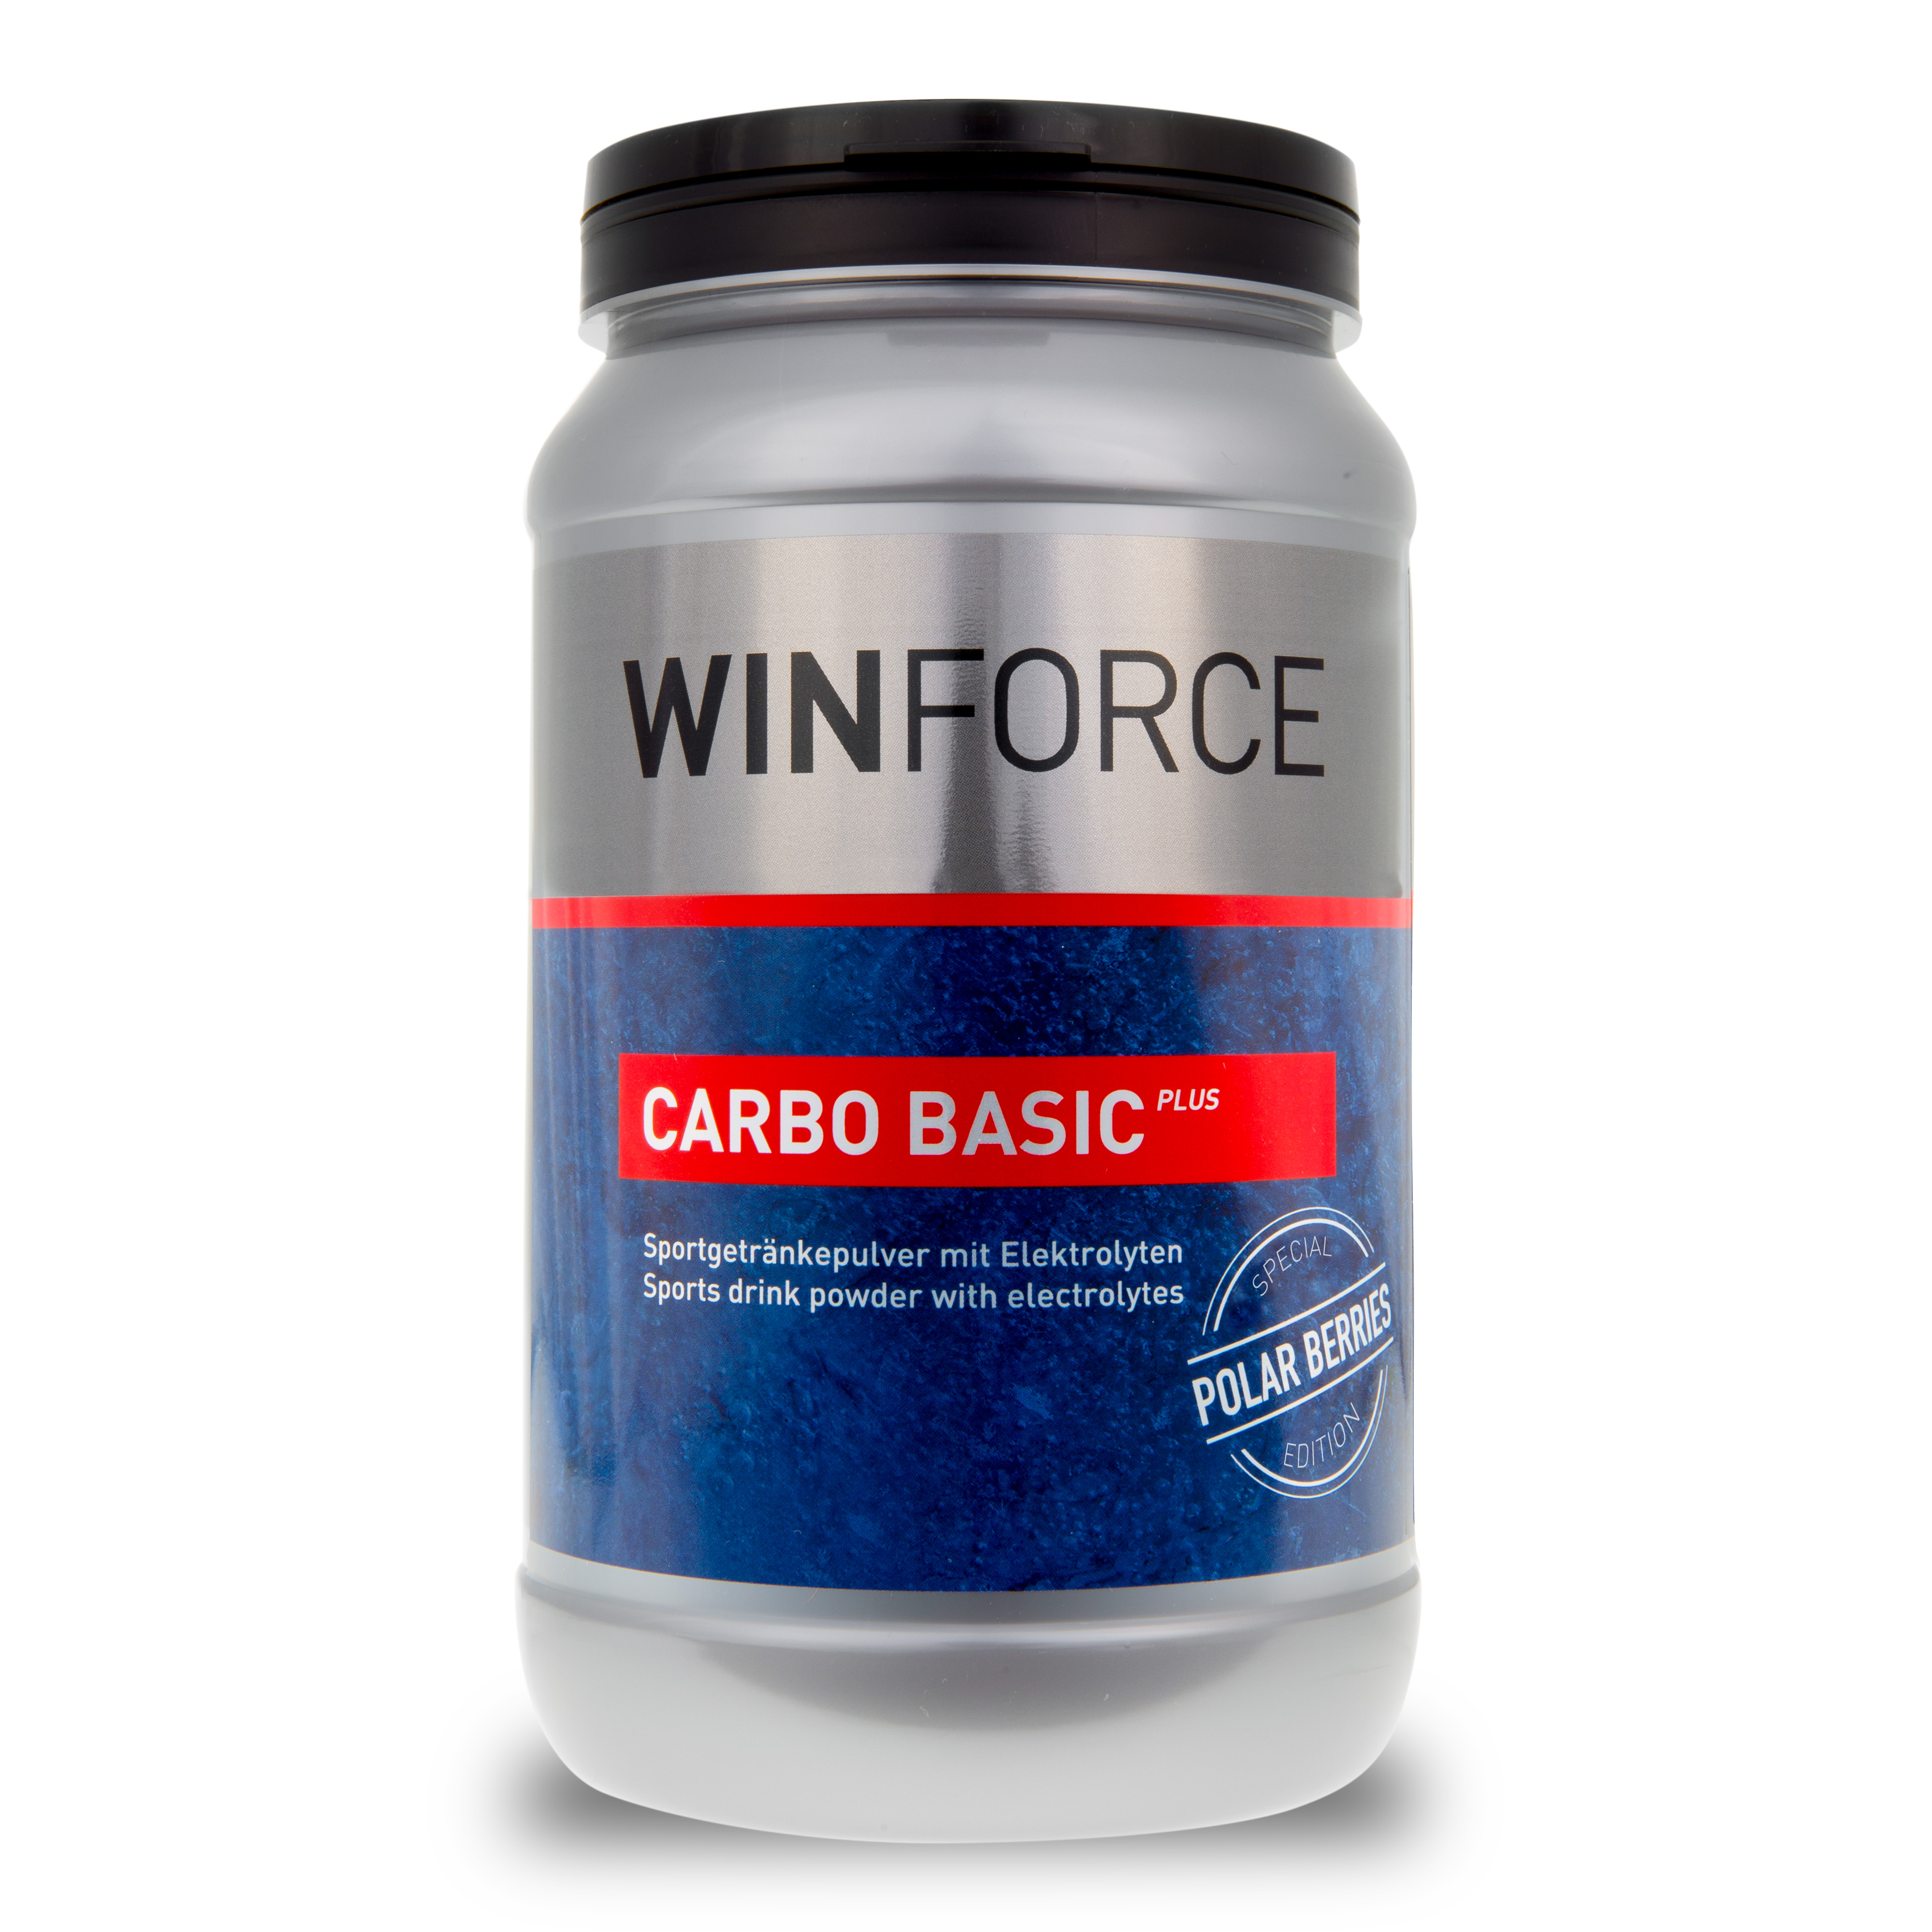 Carbo Basic Plus Bílá ostružina CONTAINER